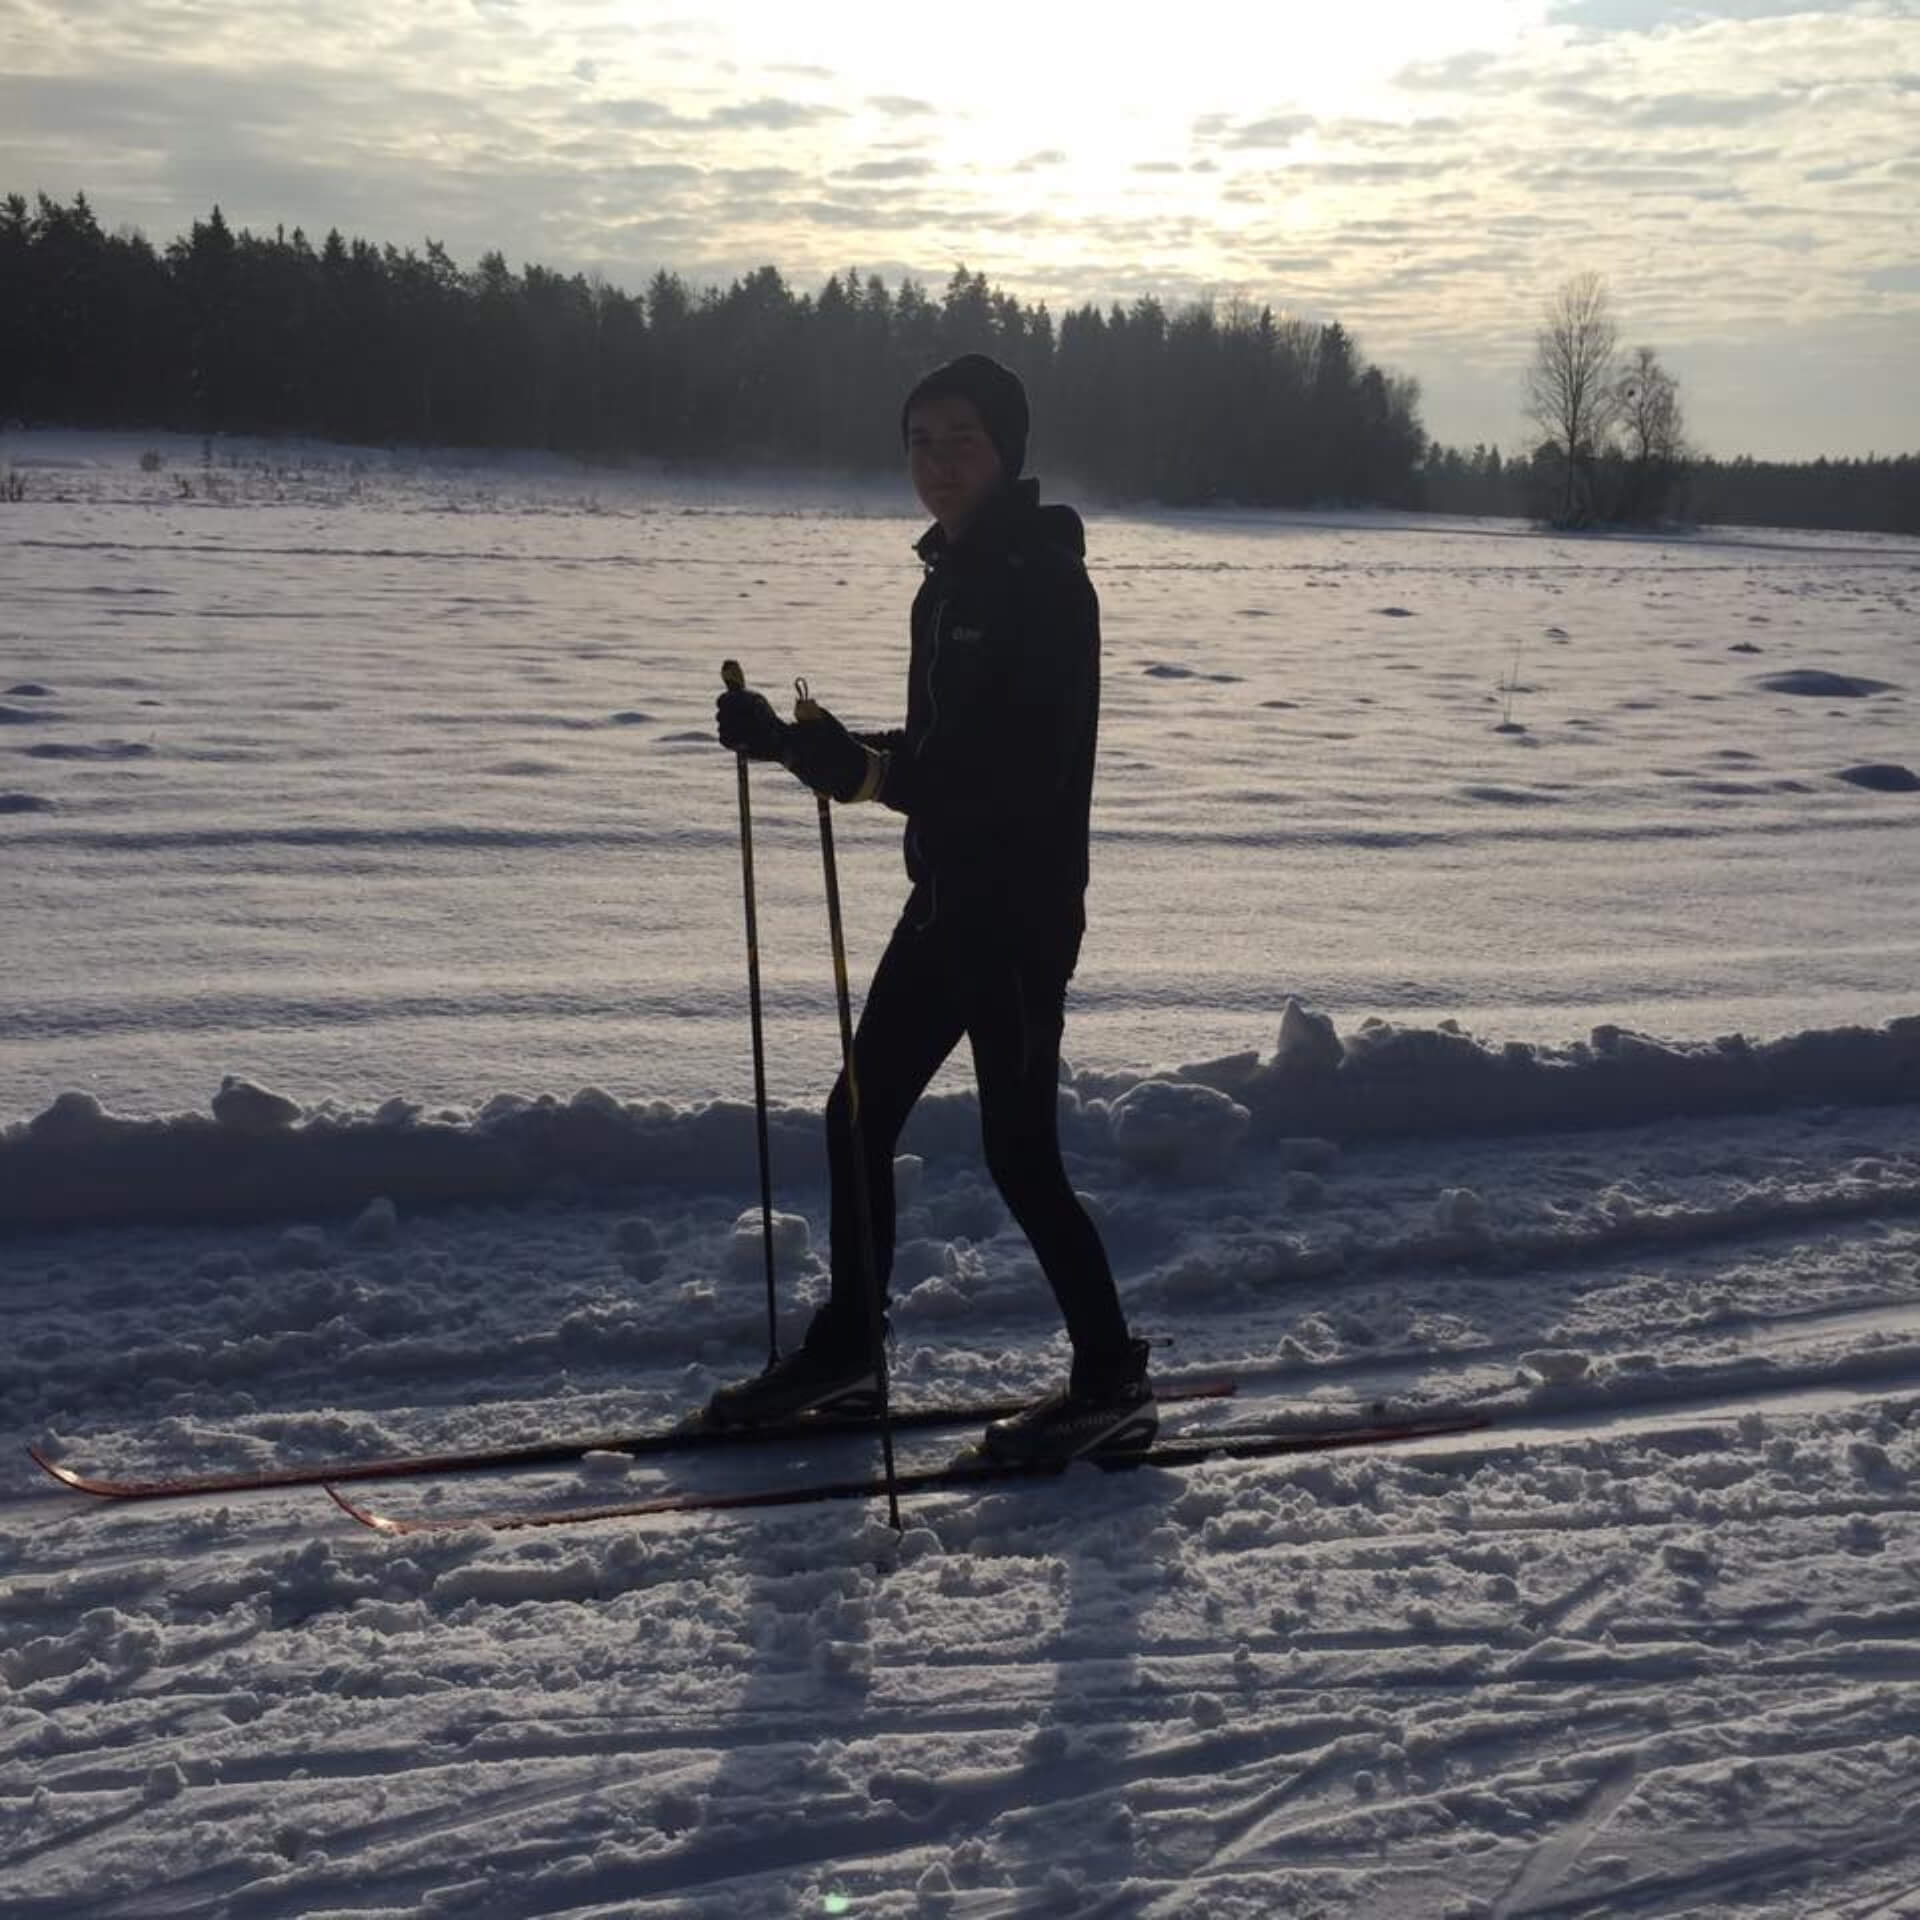 sweden vinterSkidorJacob